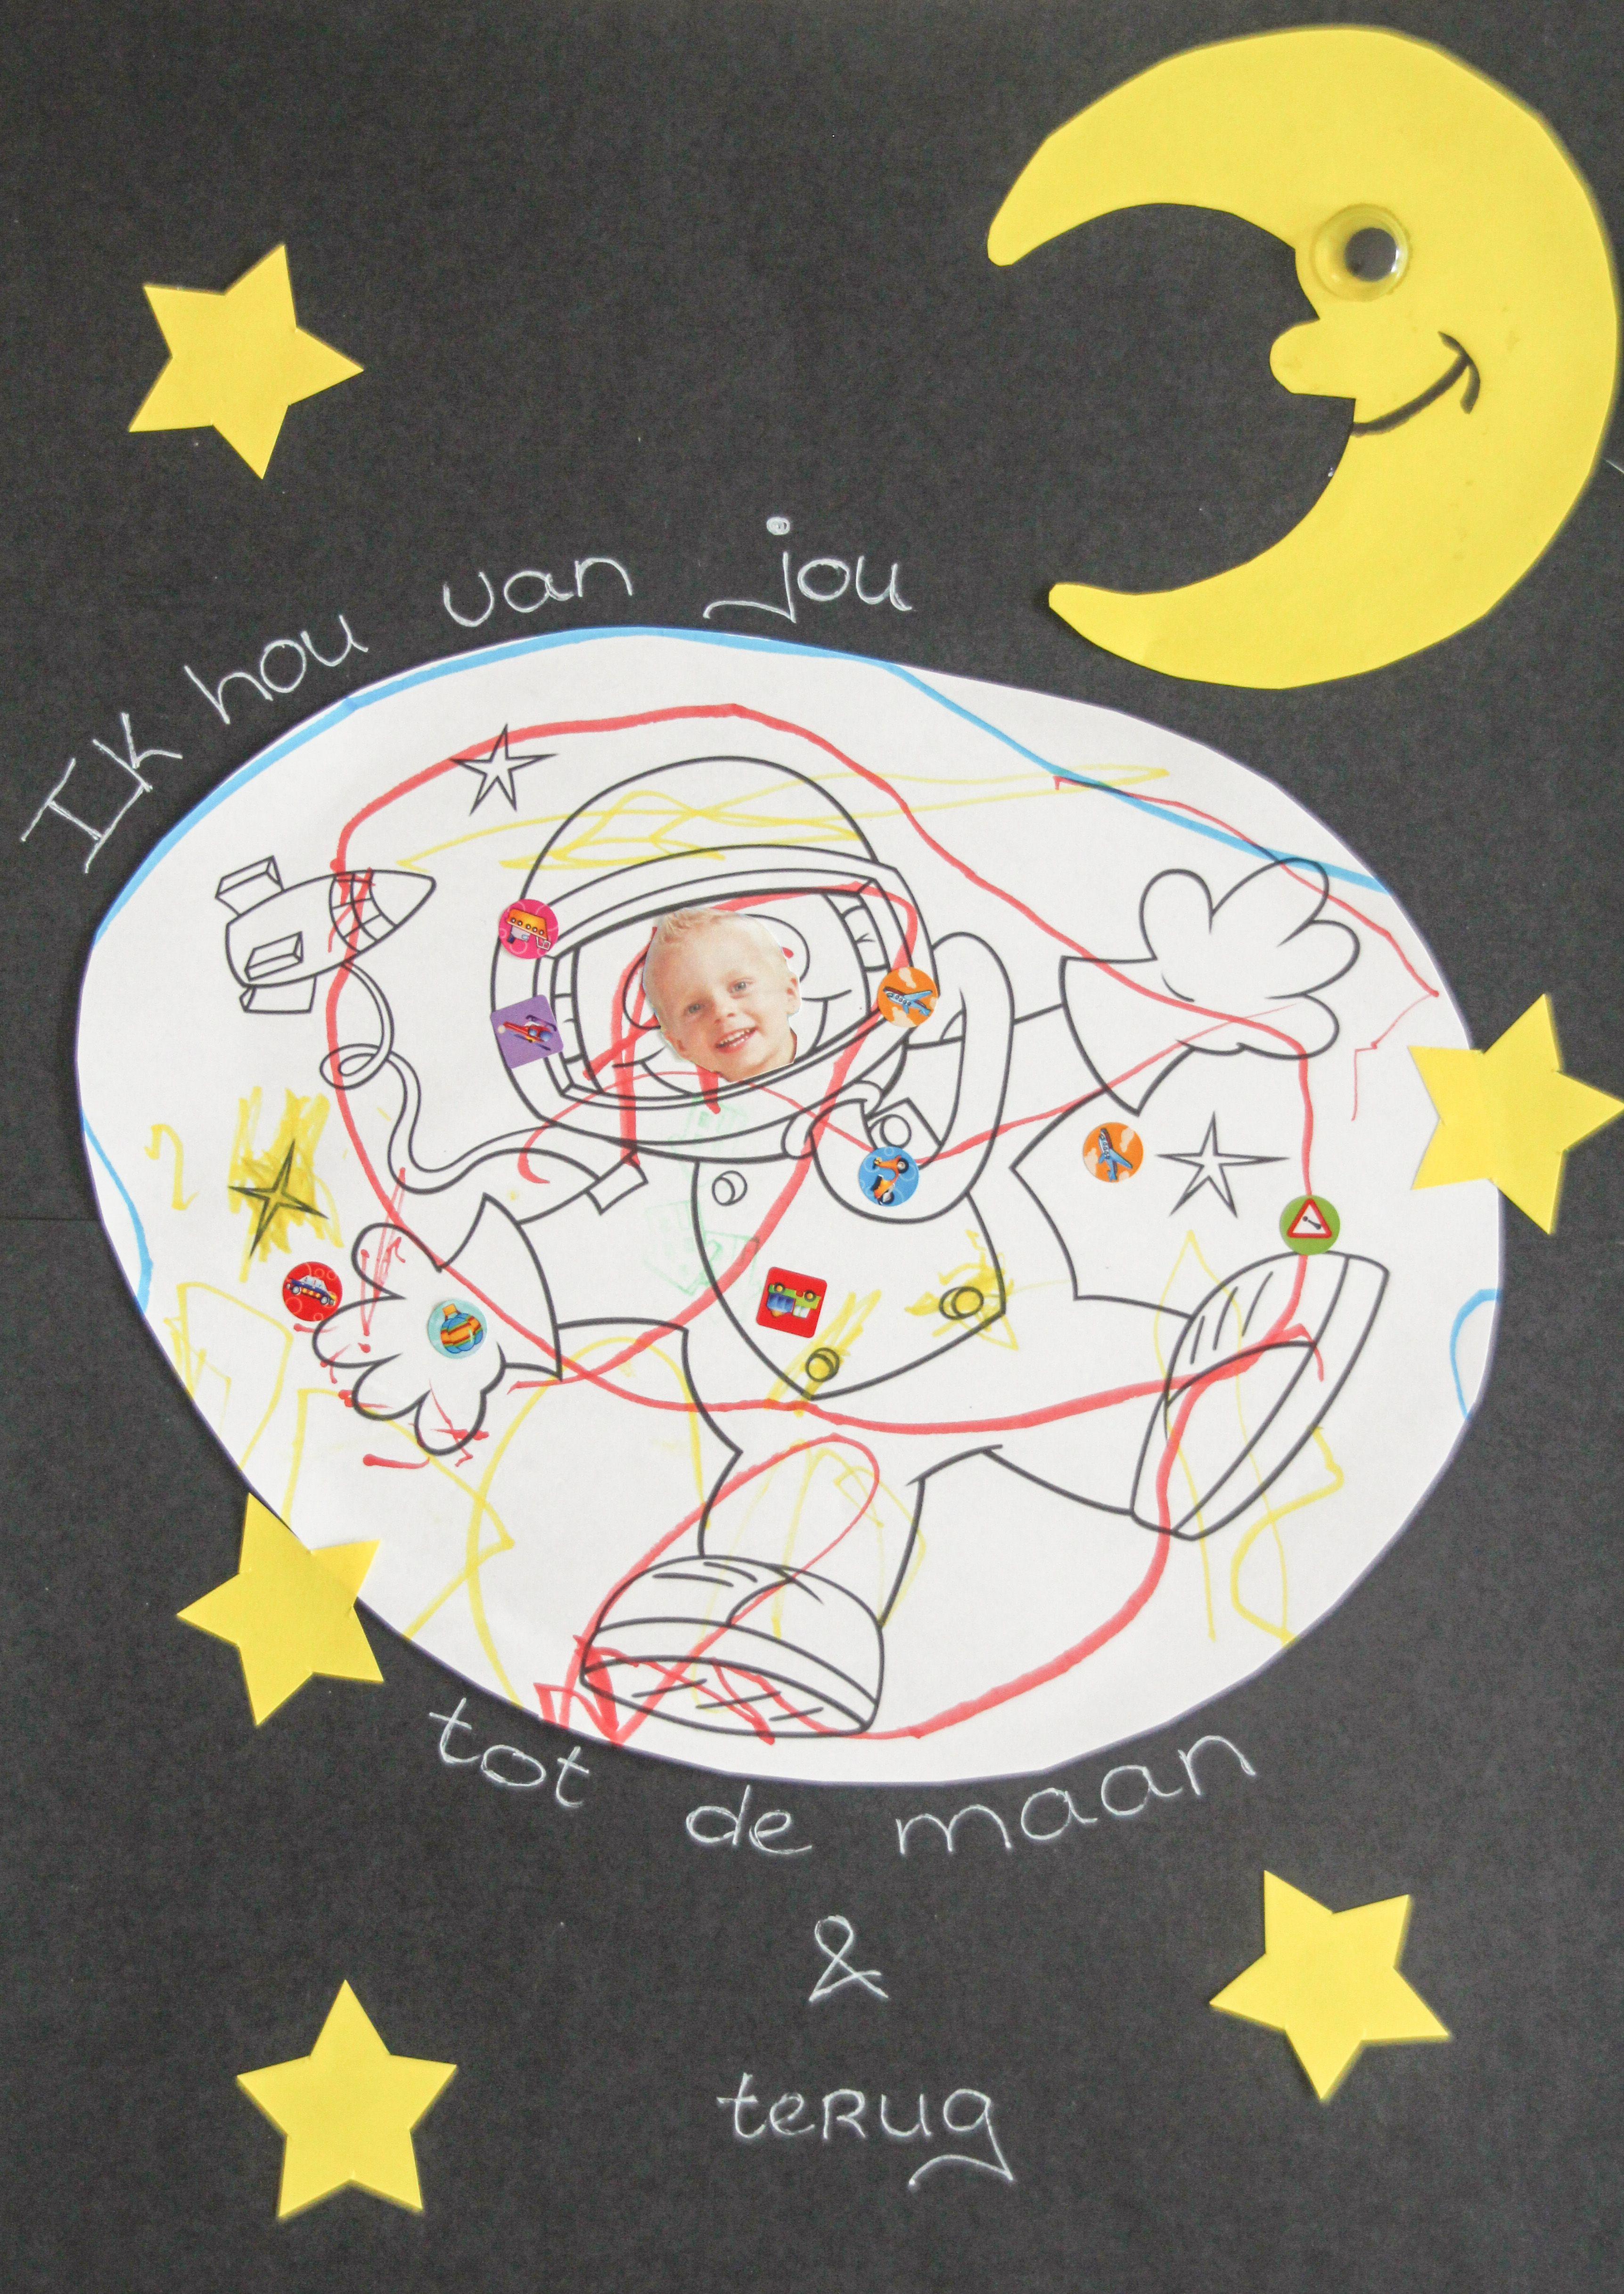 Ik Hou Van Jou Tot De Maan En Terug Leuk Idee Voor Vaderdag Moederdag Of Voor Opa Oma Afbeelding Astronaut Via Google Diy Vaderdag Moederdag Knutselen